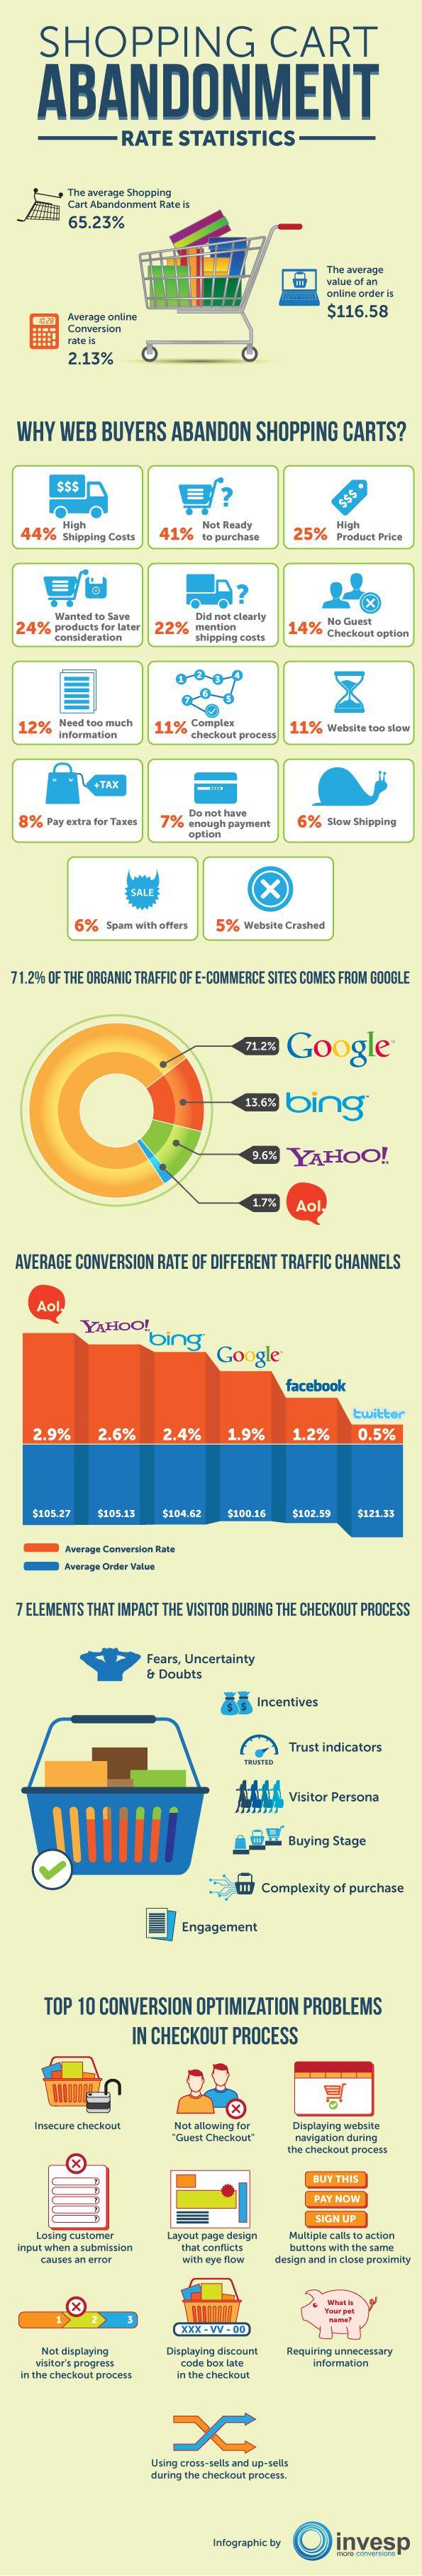 Entenda os motivos que levam os consumidores a abandonar  carrinhos de compra virtuais. #Ecommerce #Infográfico